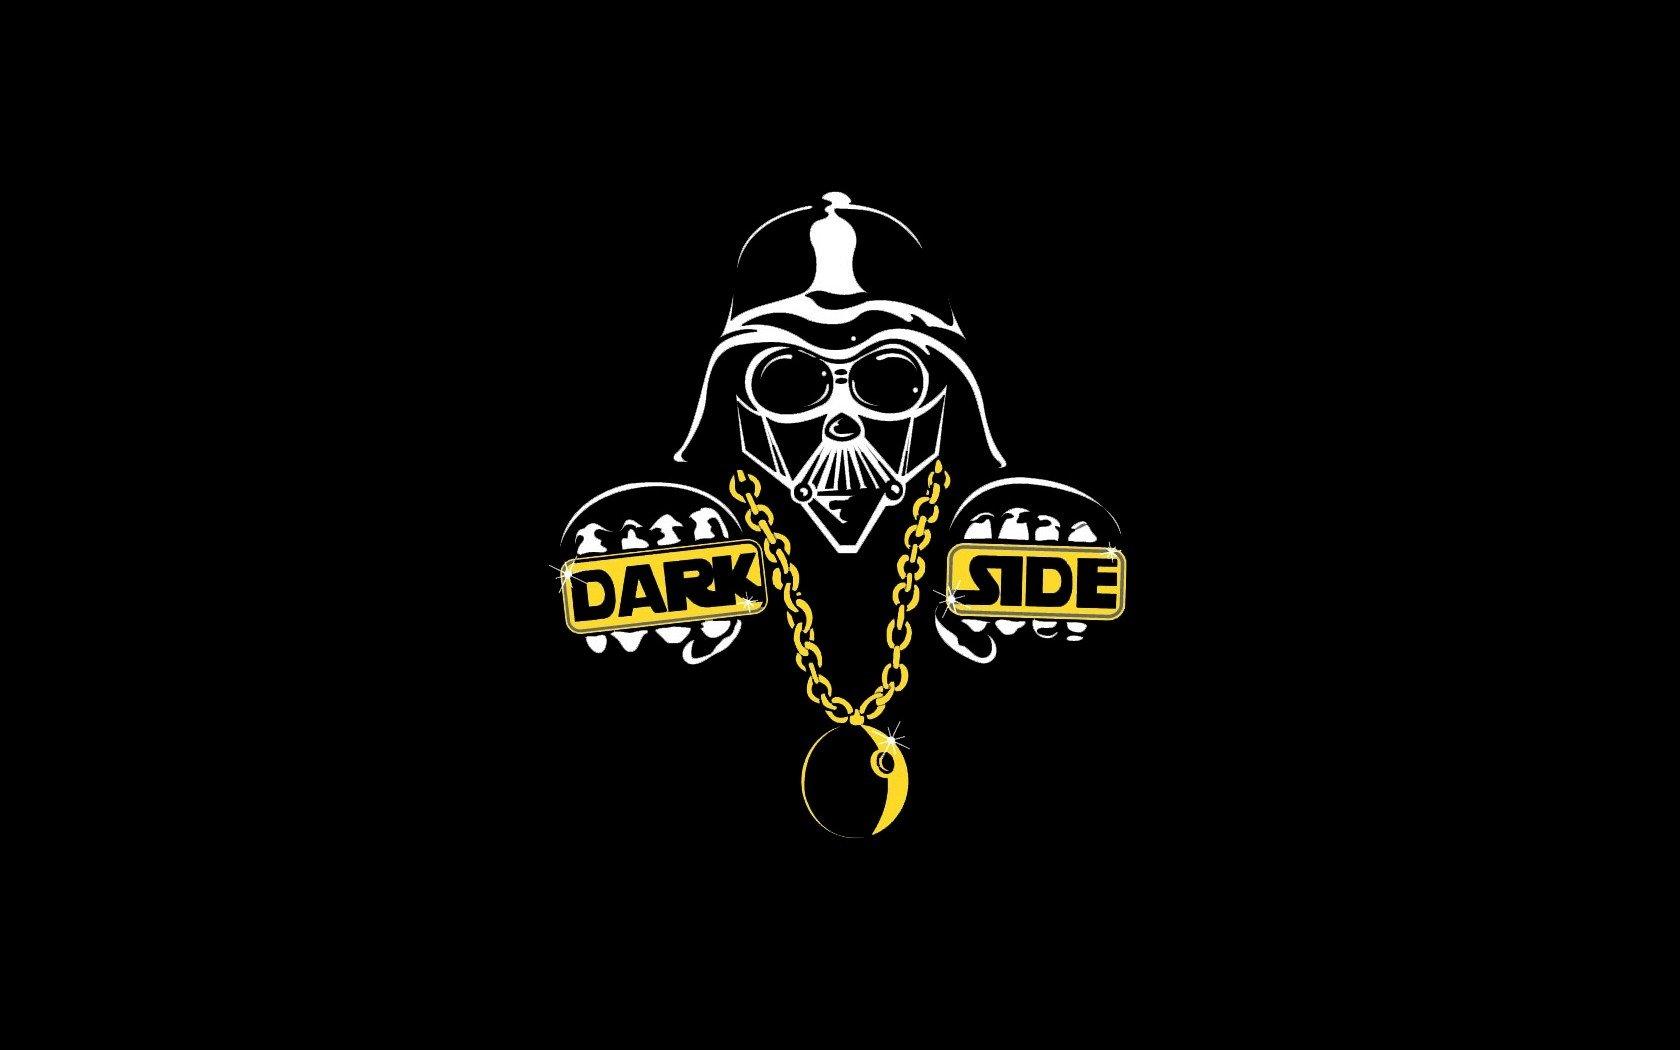 Darth Vader funny dark side black background wallpaper 1680x1050 1680x1050